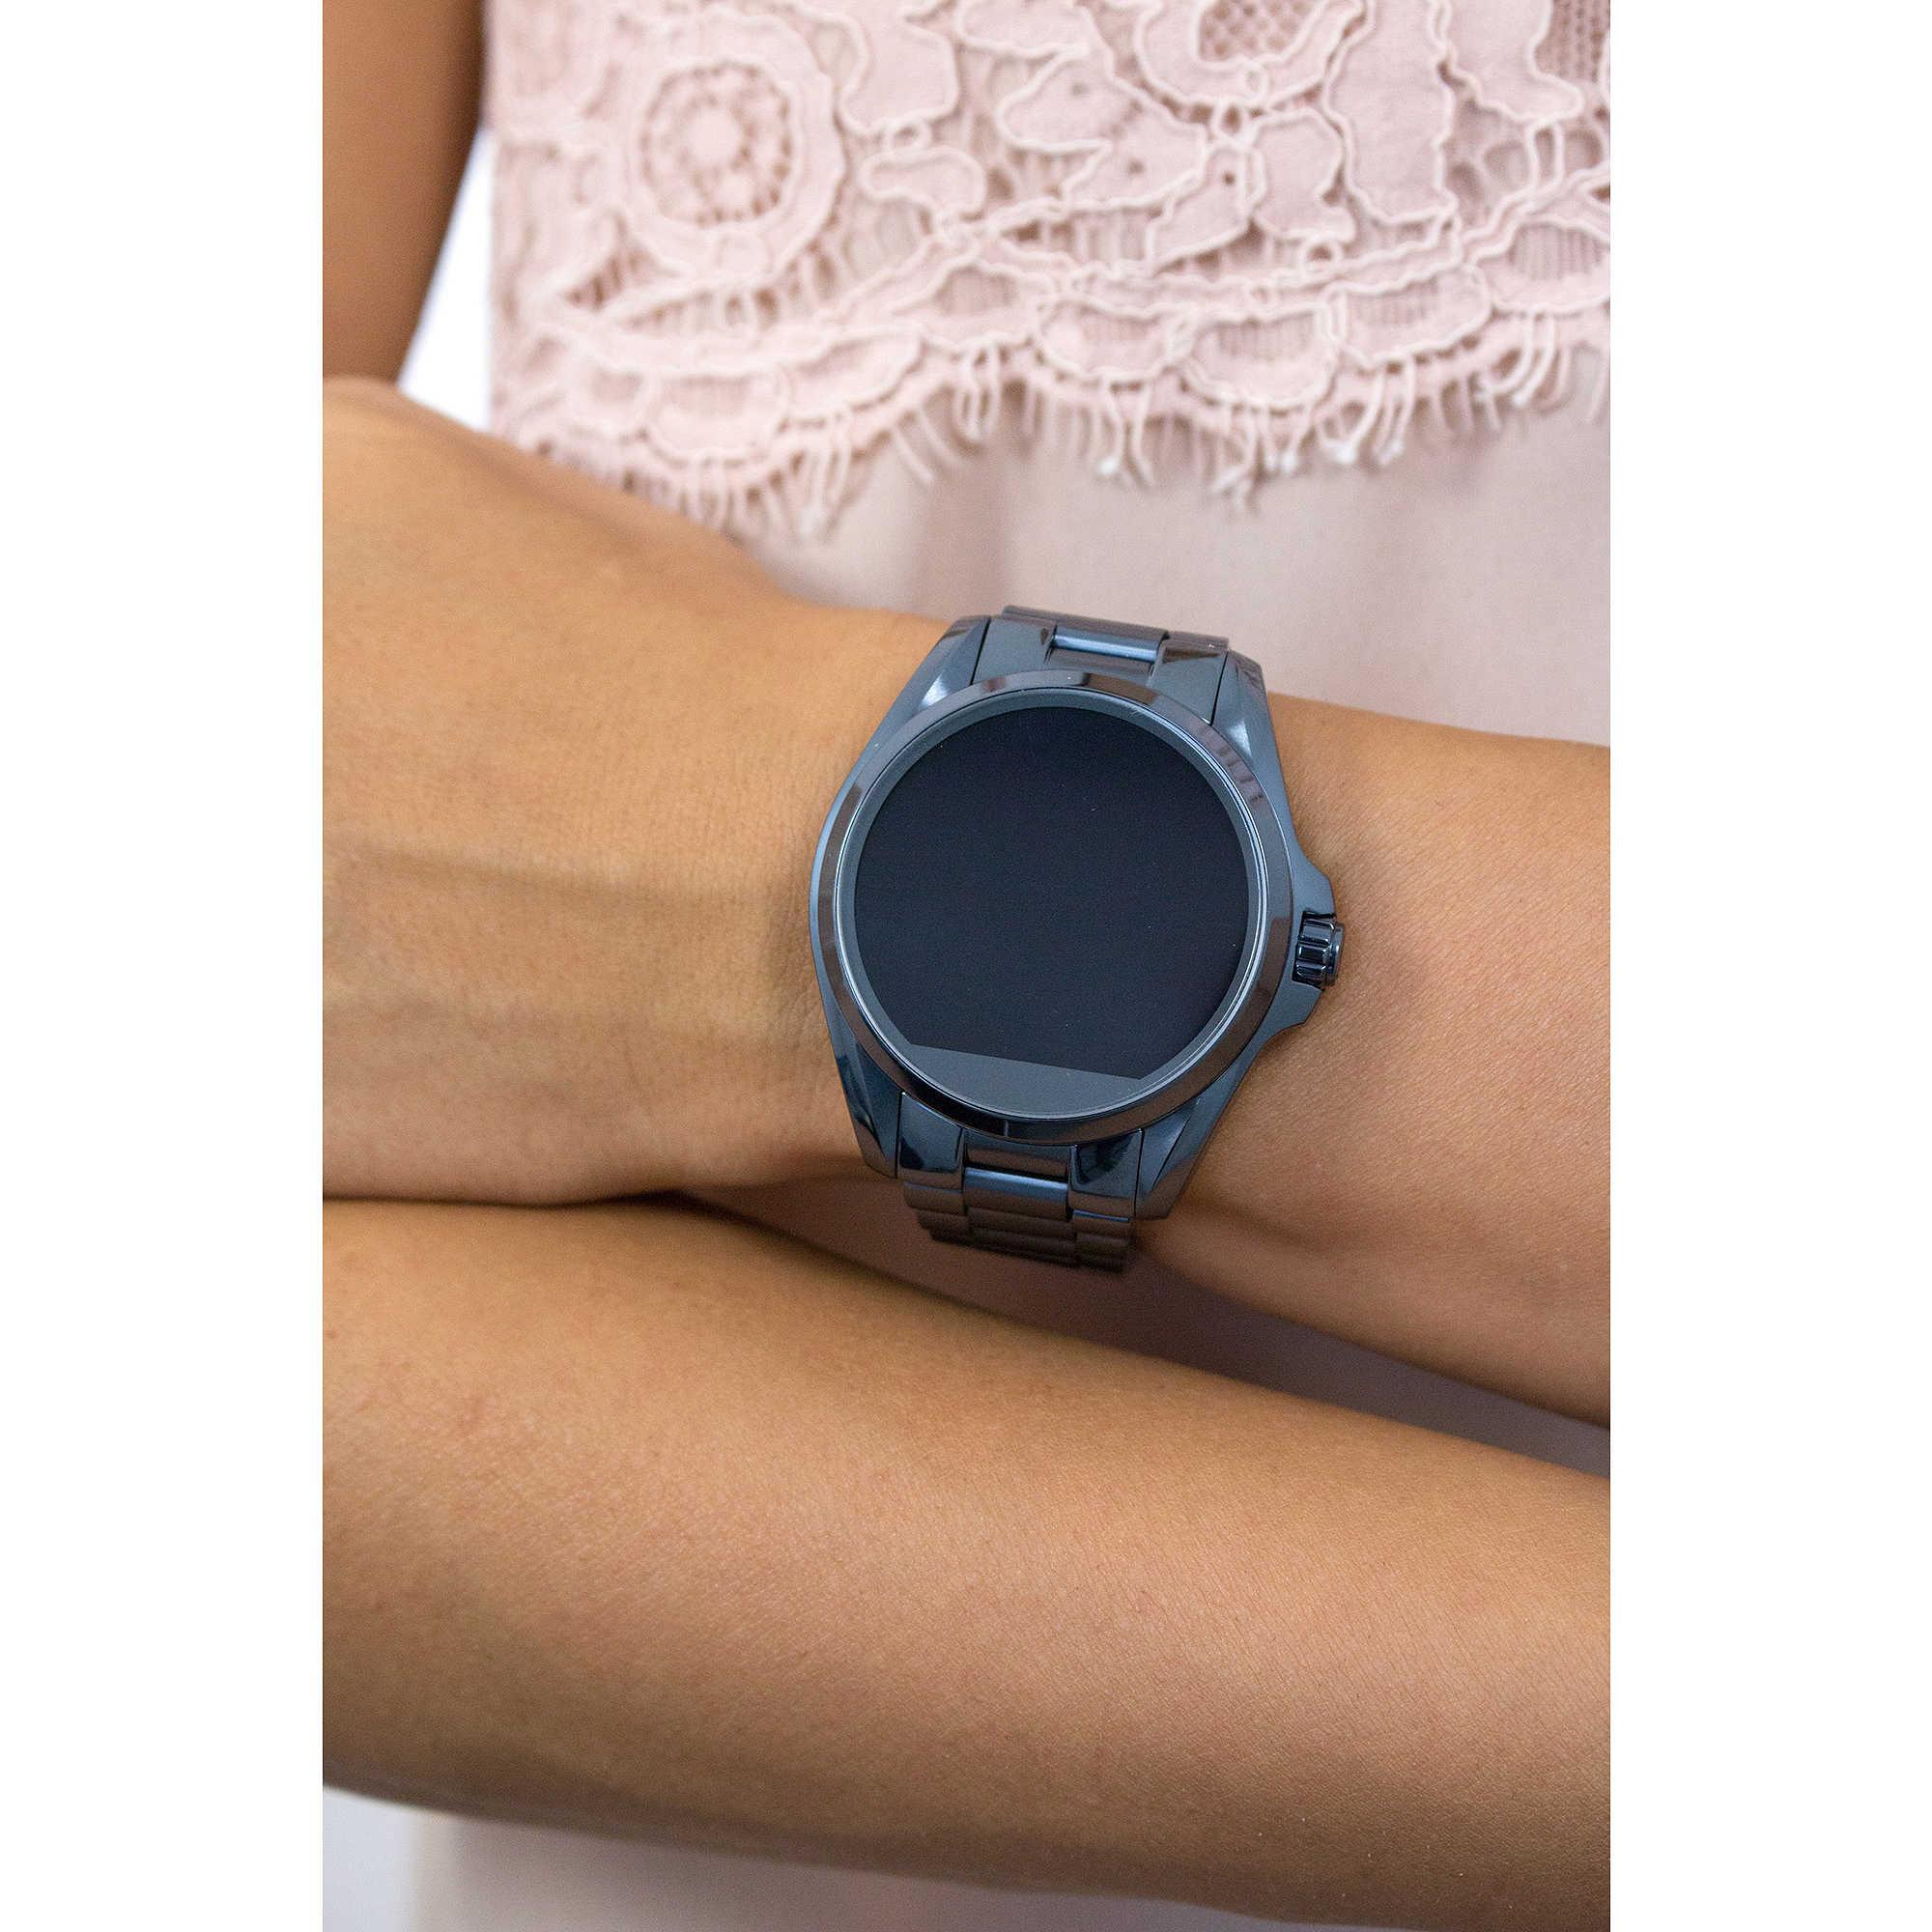 watch smartwatch woman michael kors mkt5006 smartwatches. Black Bedroom Furniture Sets. Home Design Ideas